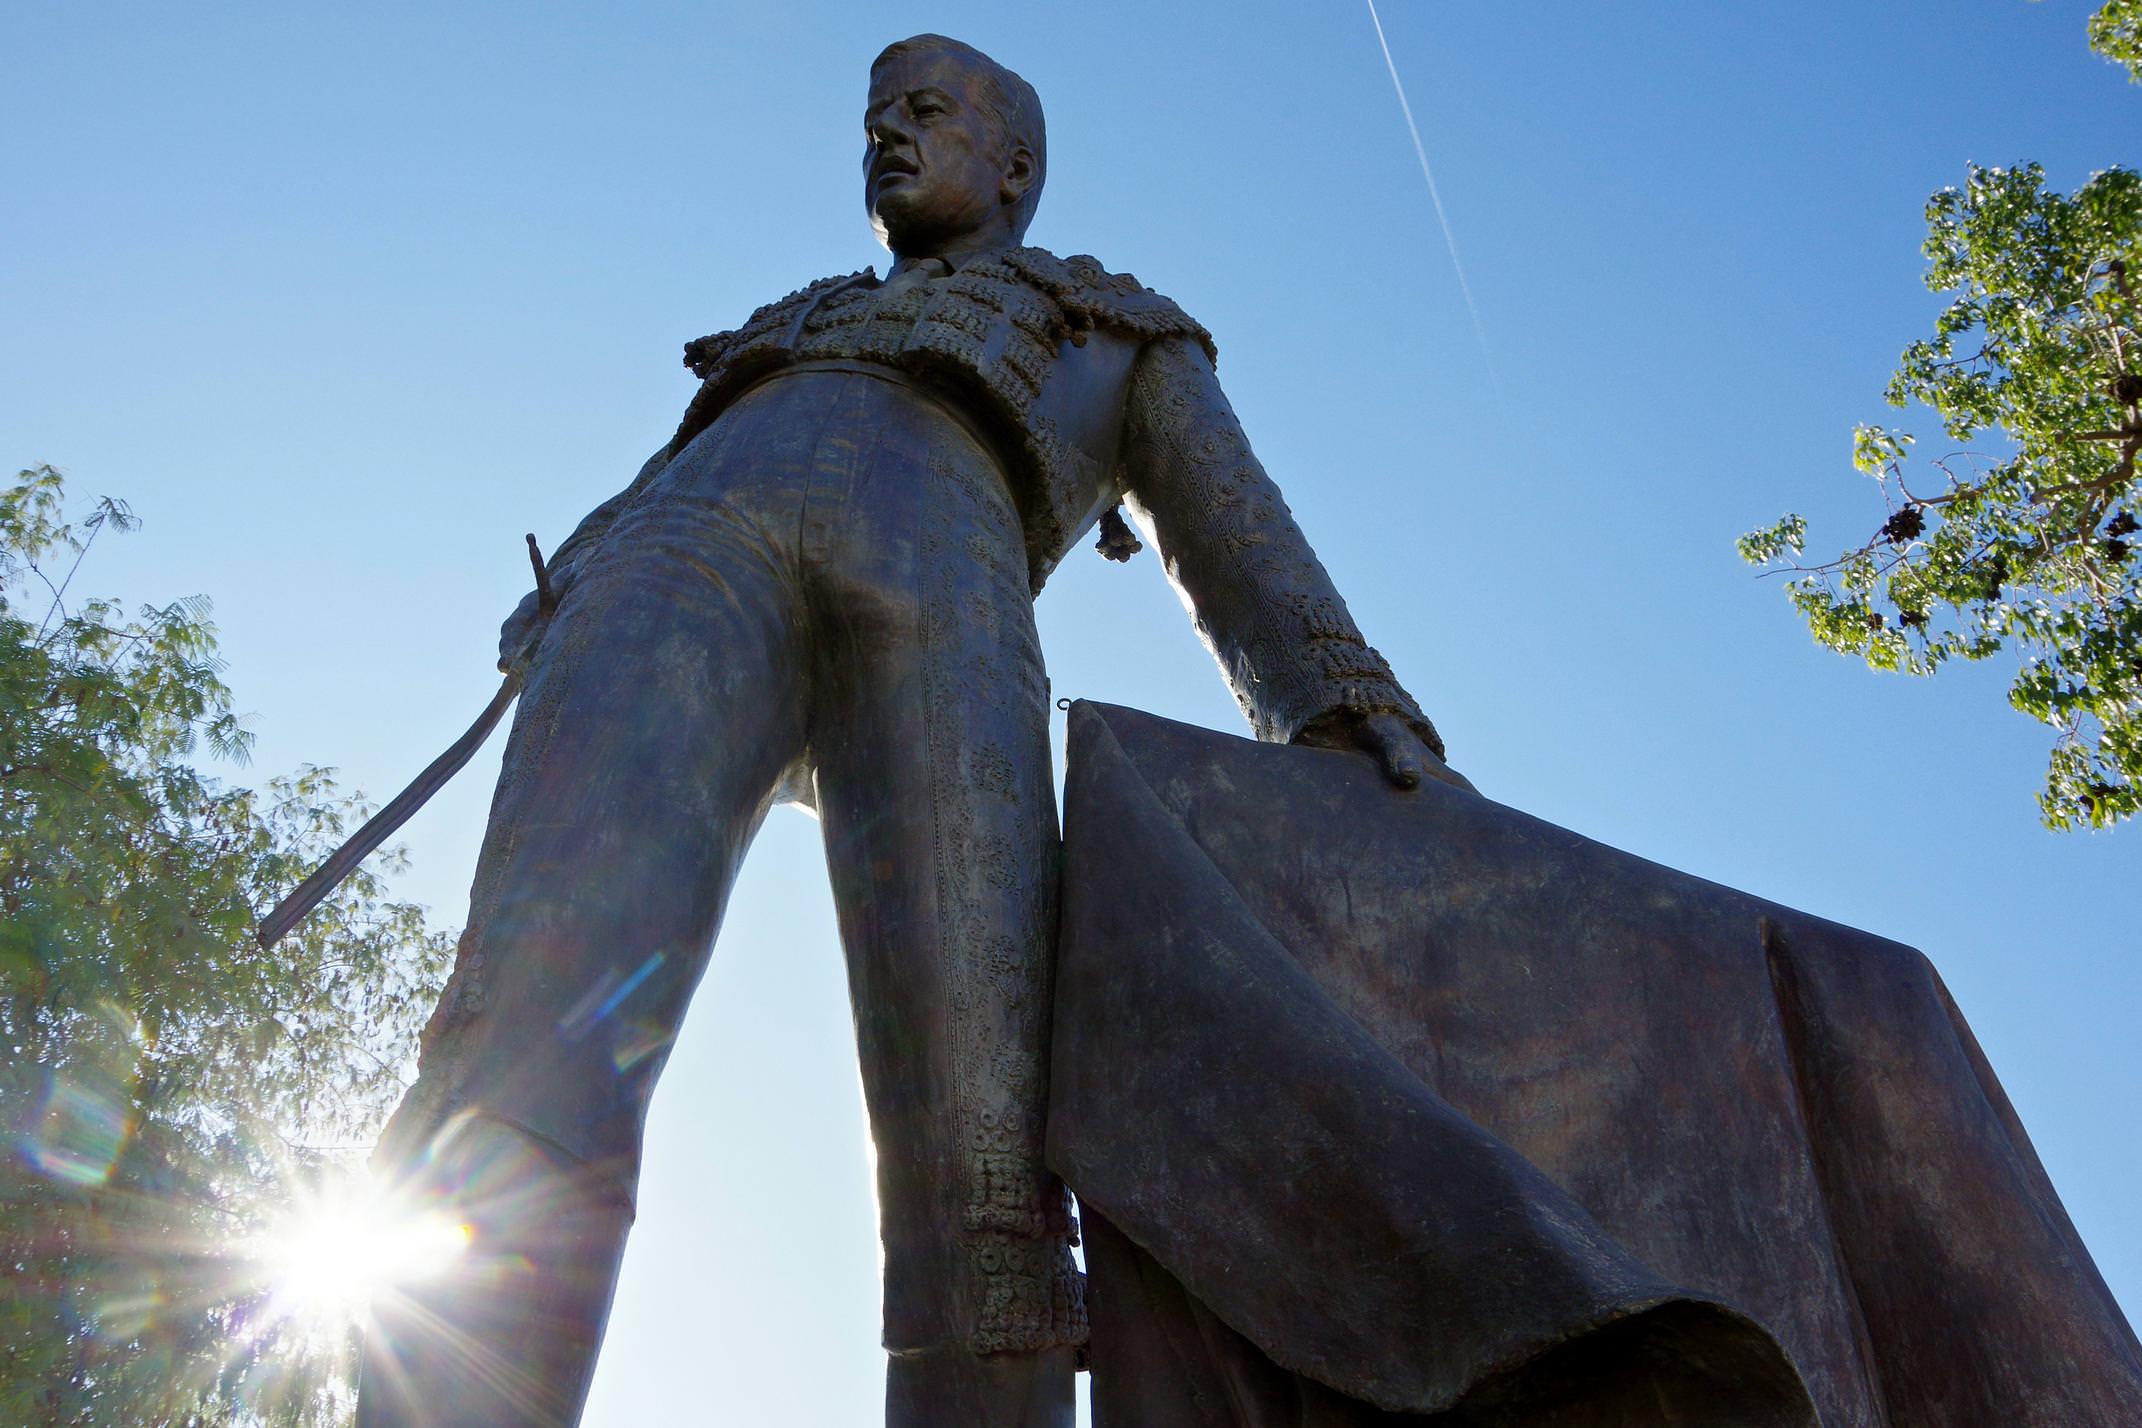 Matador statue outside Seville's plaza de toros